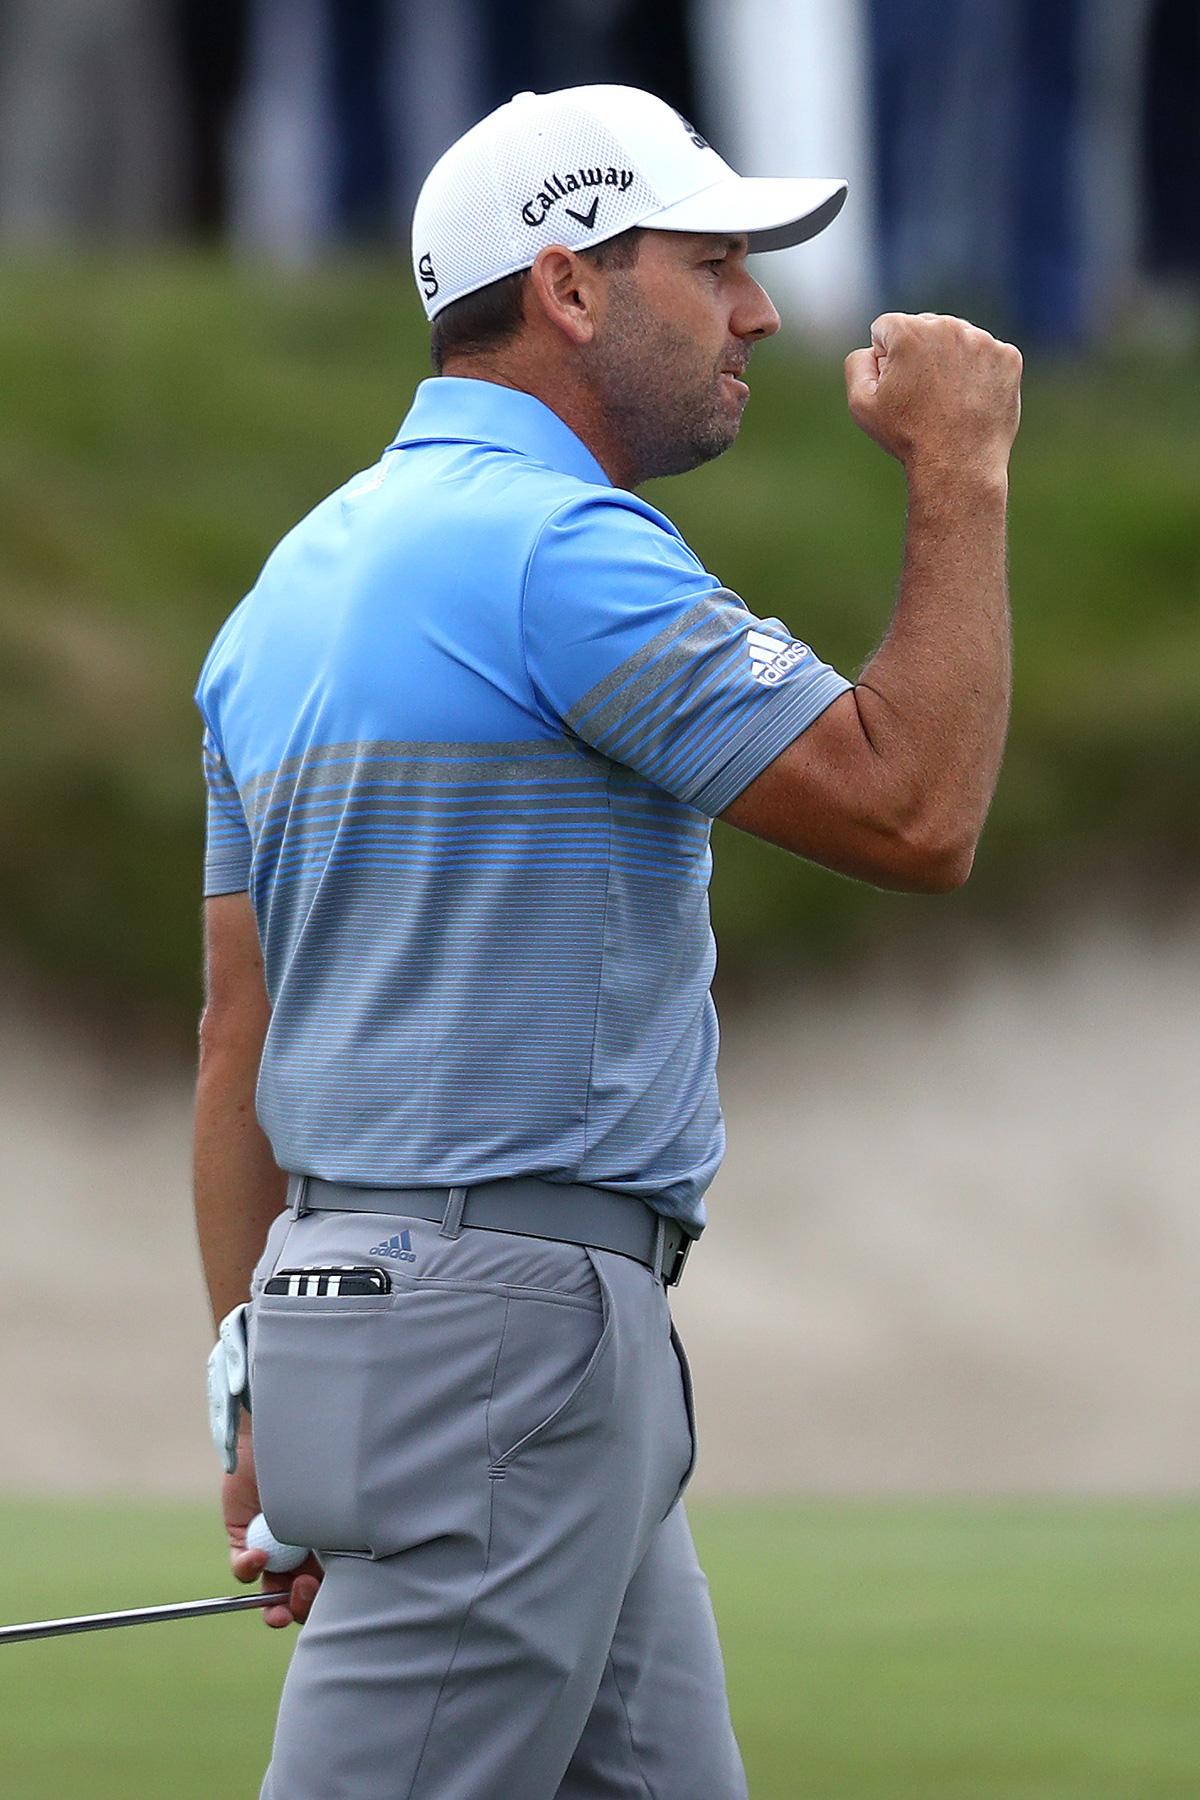 Sergio Garcia Closes Out His 16th Career European Tour Victory Player Profile Thumbnail